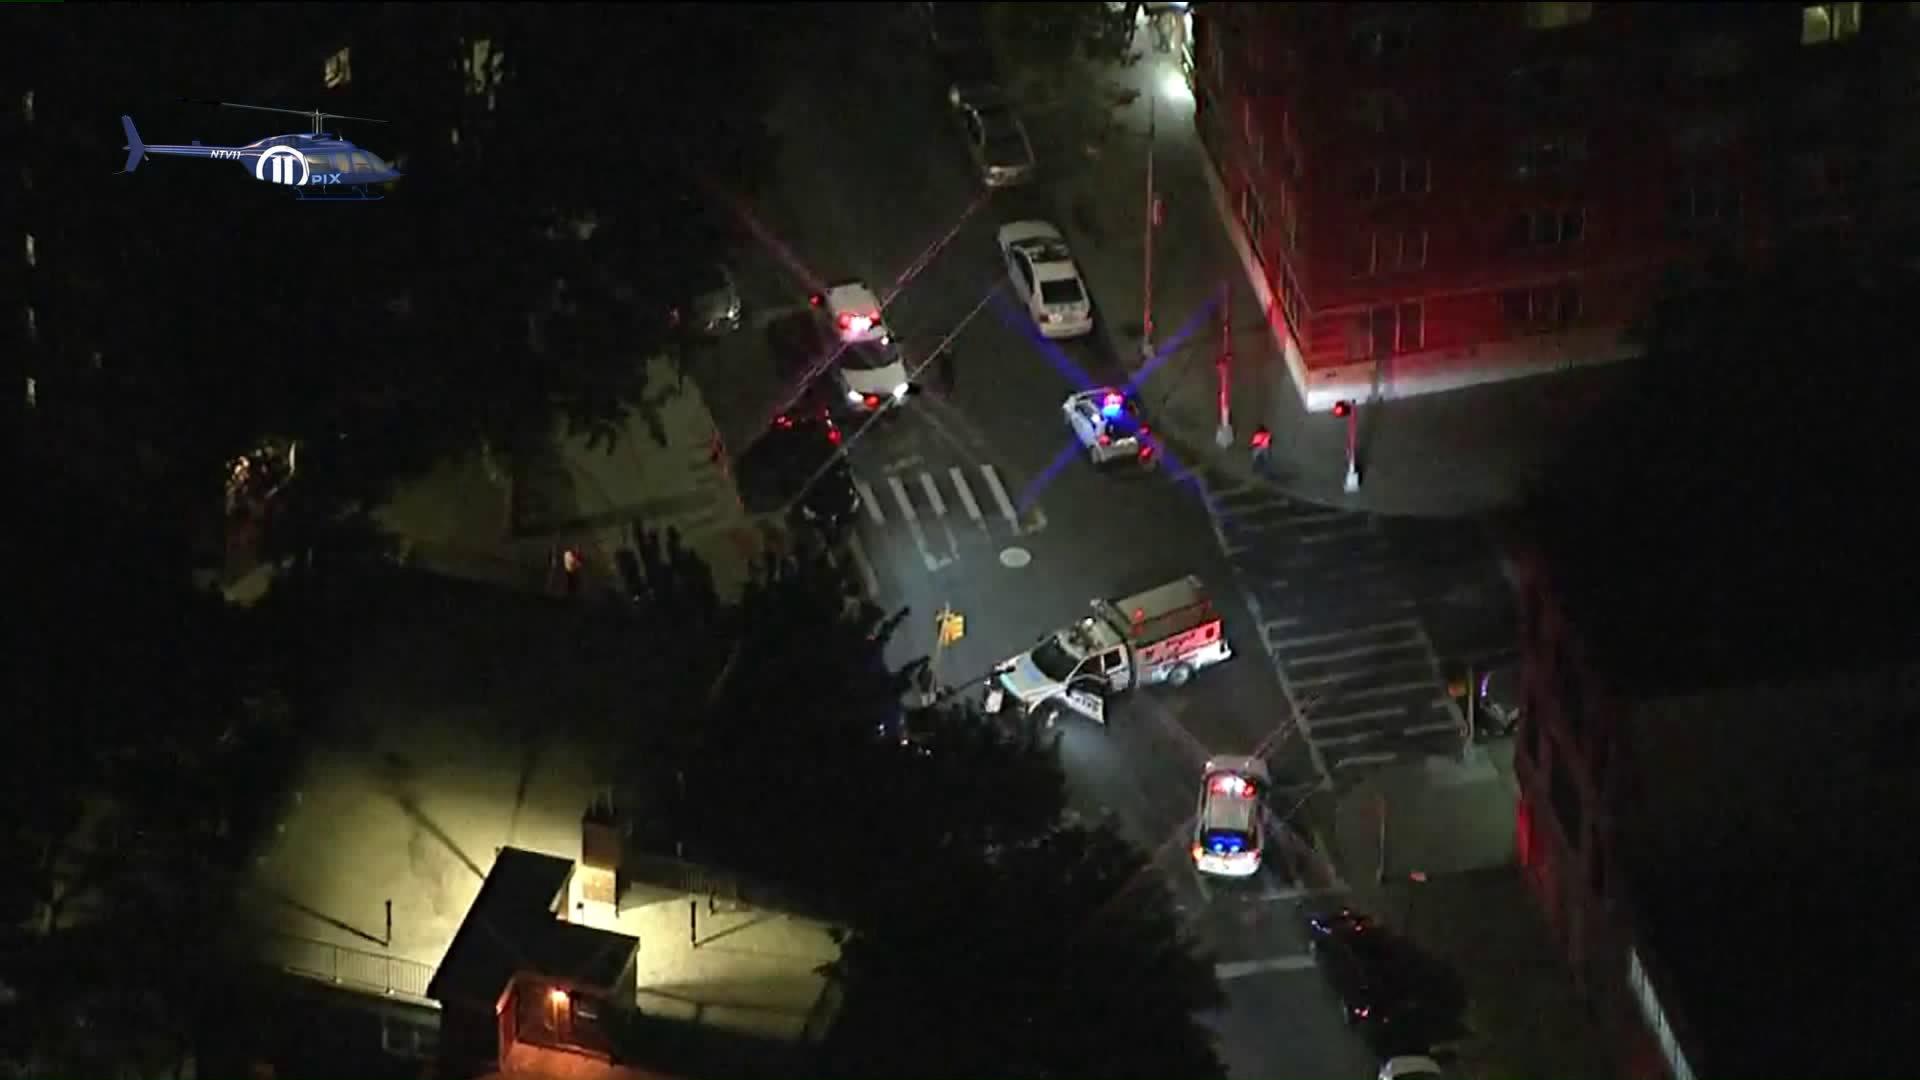 AIR11-TUESDAY NIGHT POLICE INVOLVED SHOOTING - BROOKLYN